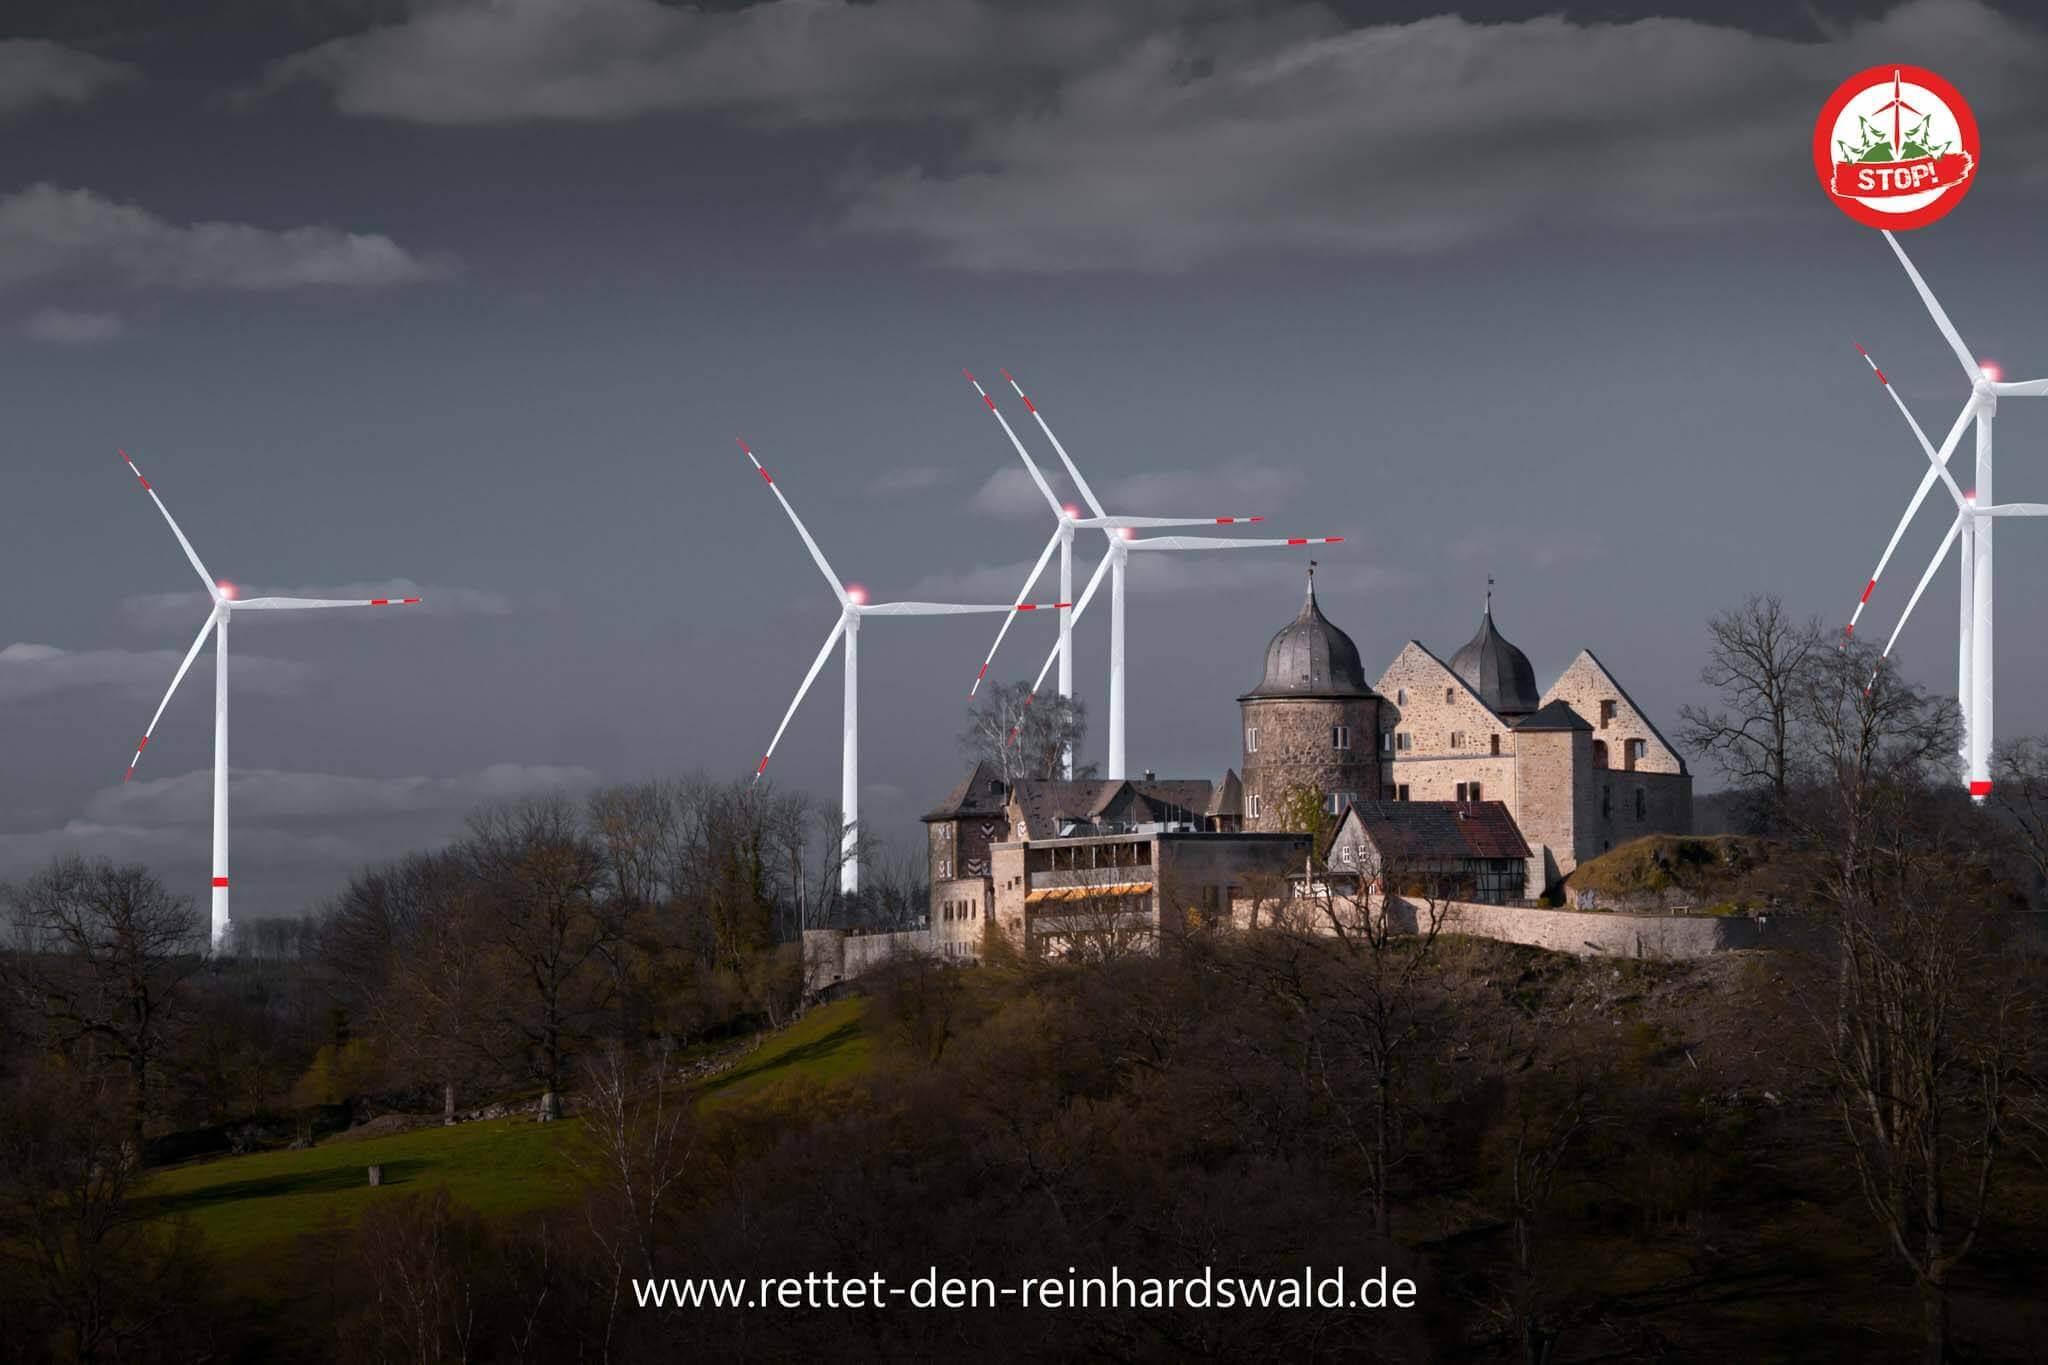 Reinhardswald